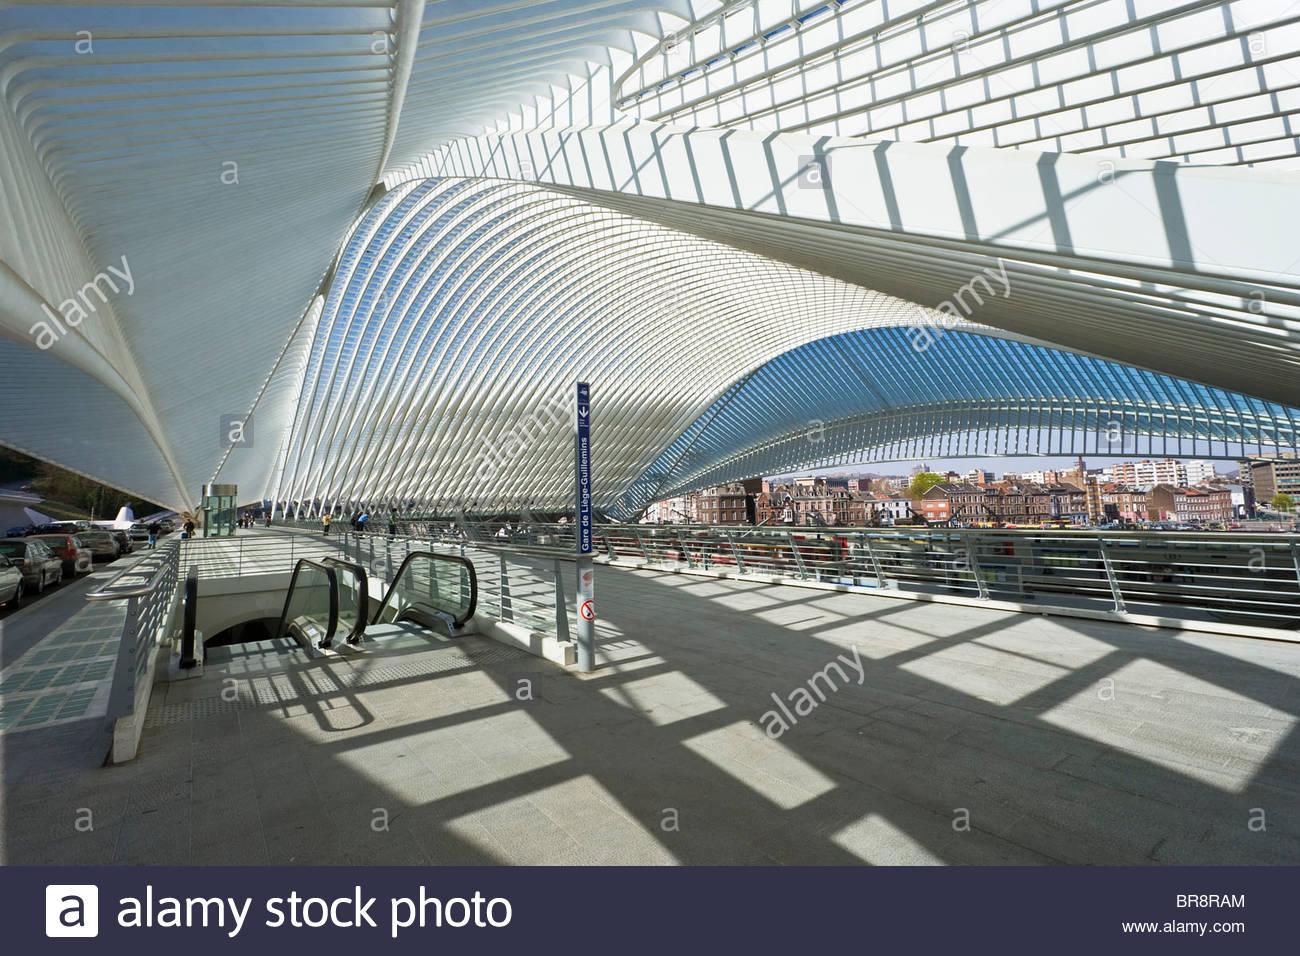 Li 232 Ge Guillemins Train Station Platform Escalator Modern